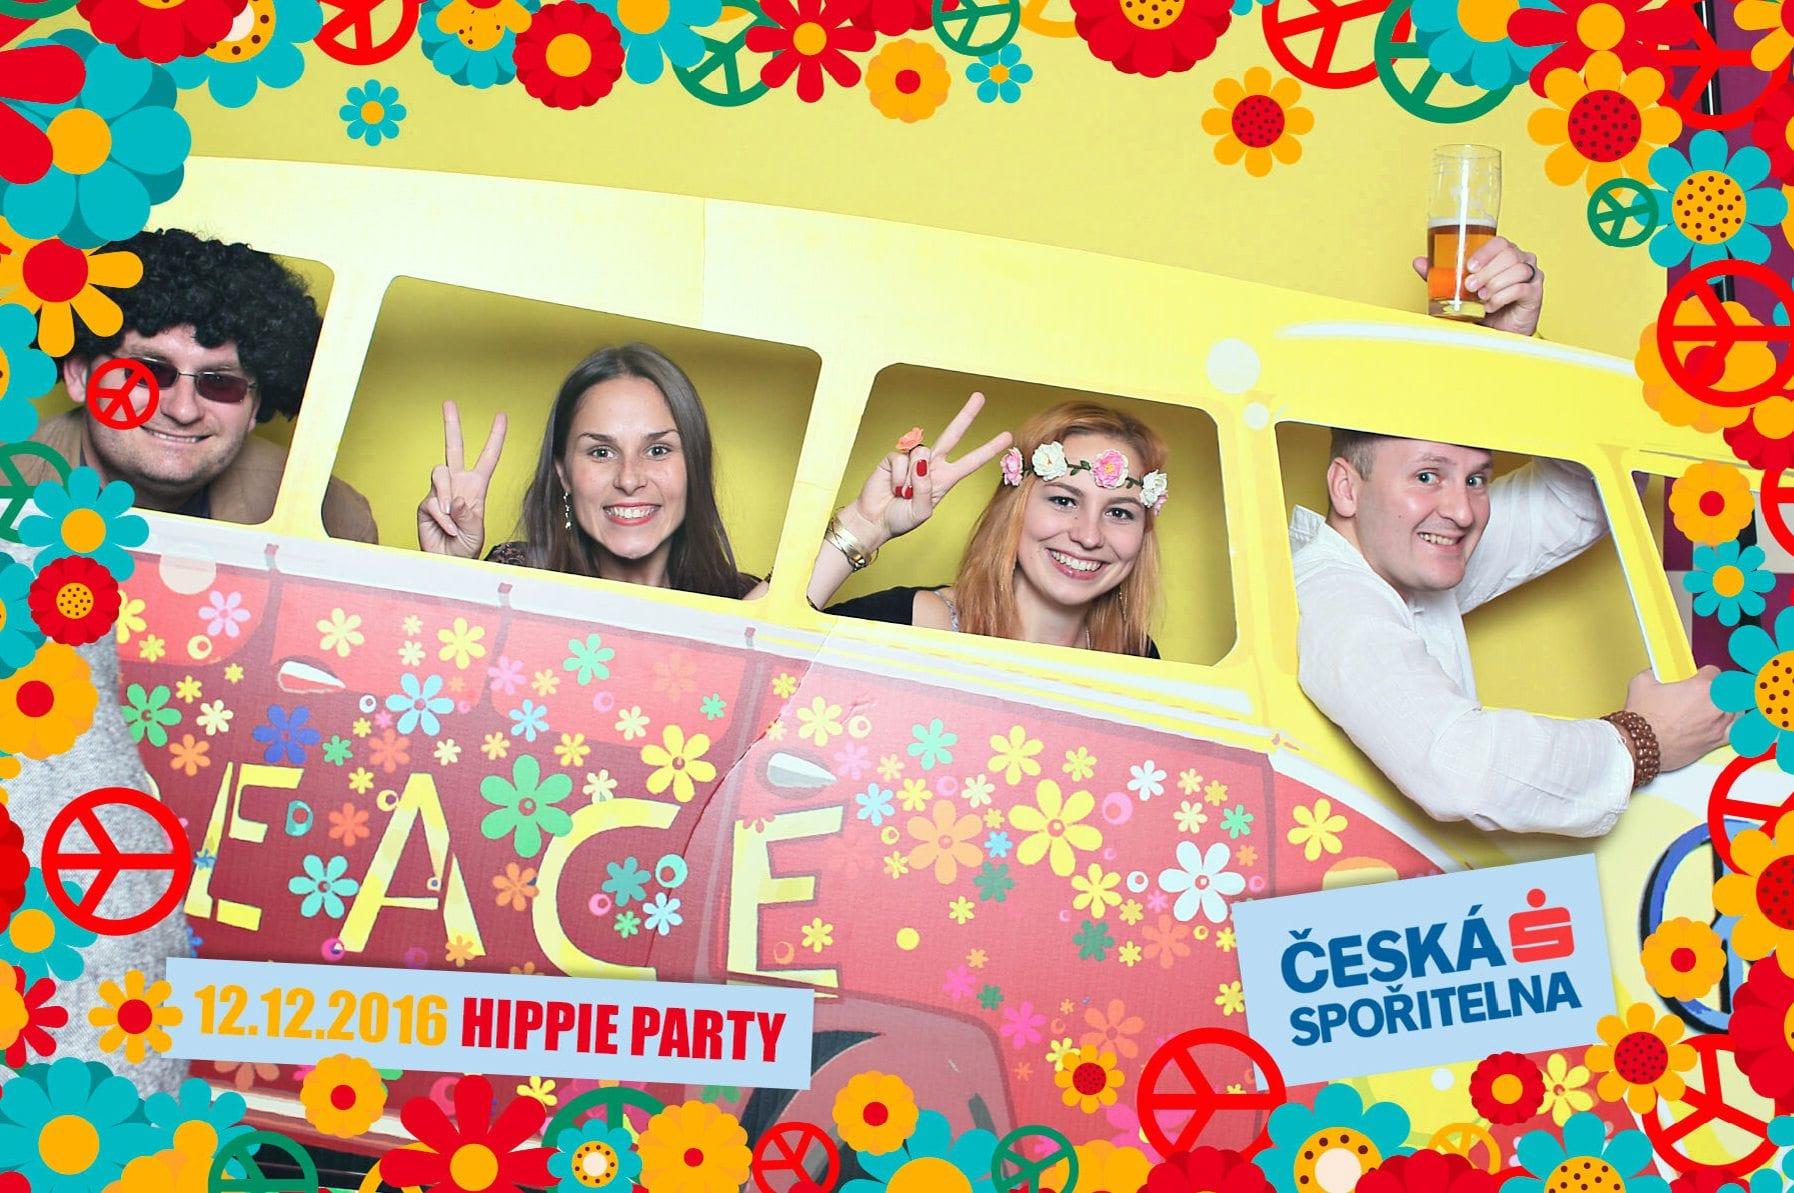 fotokoutek-ceska-sporitelna-hippie-party-12-12-2016-184825